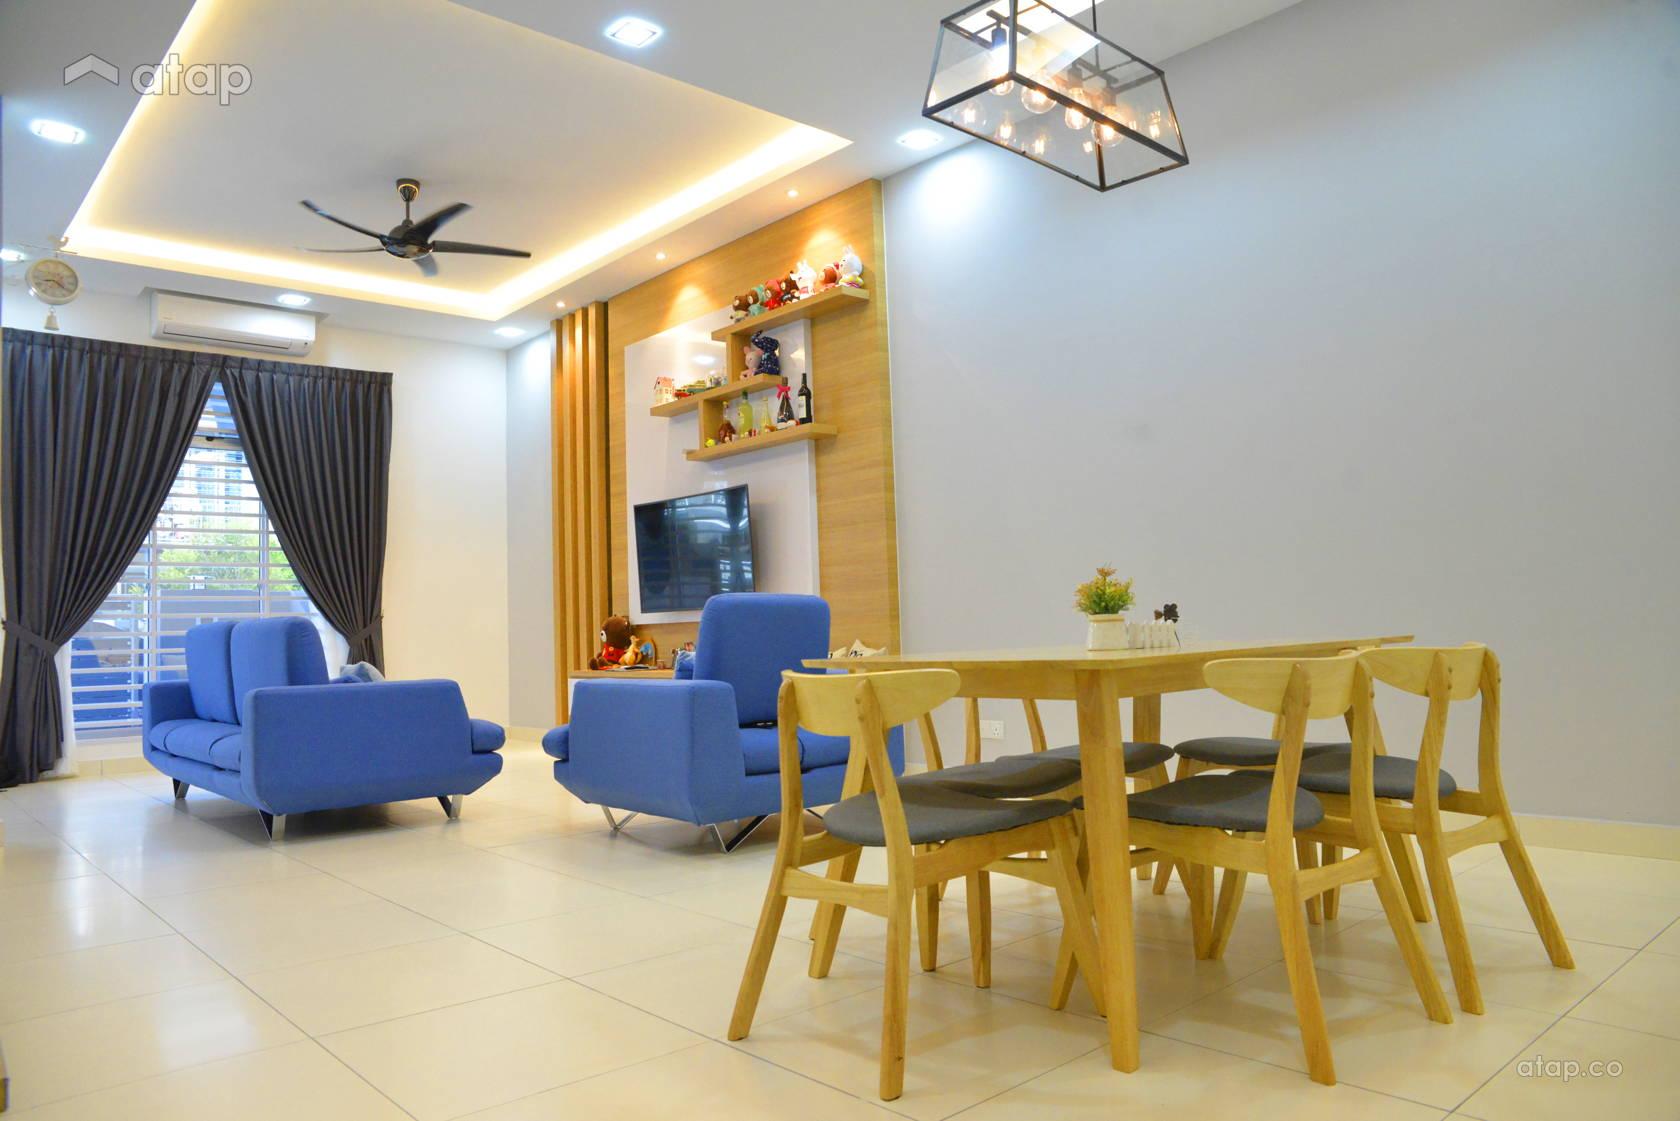 Mesmerising living room designs in johor for Living room design johor bahru